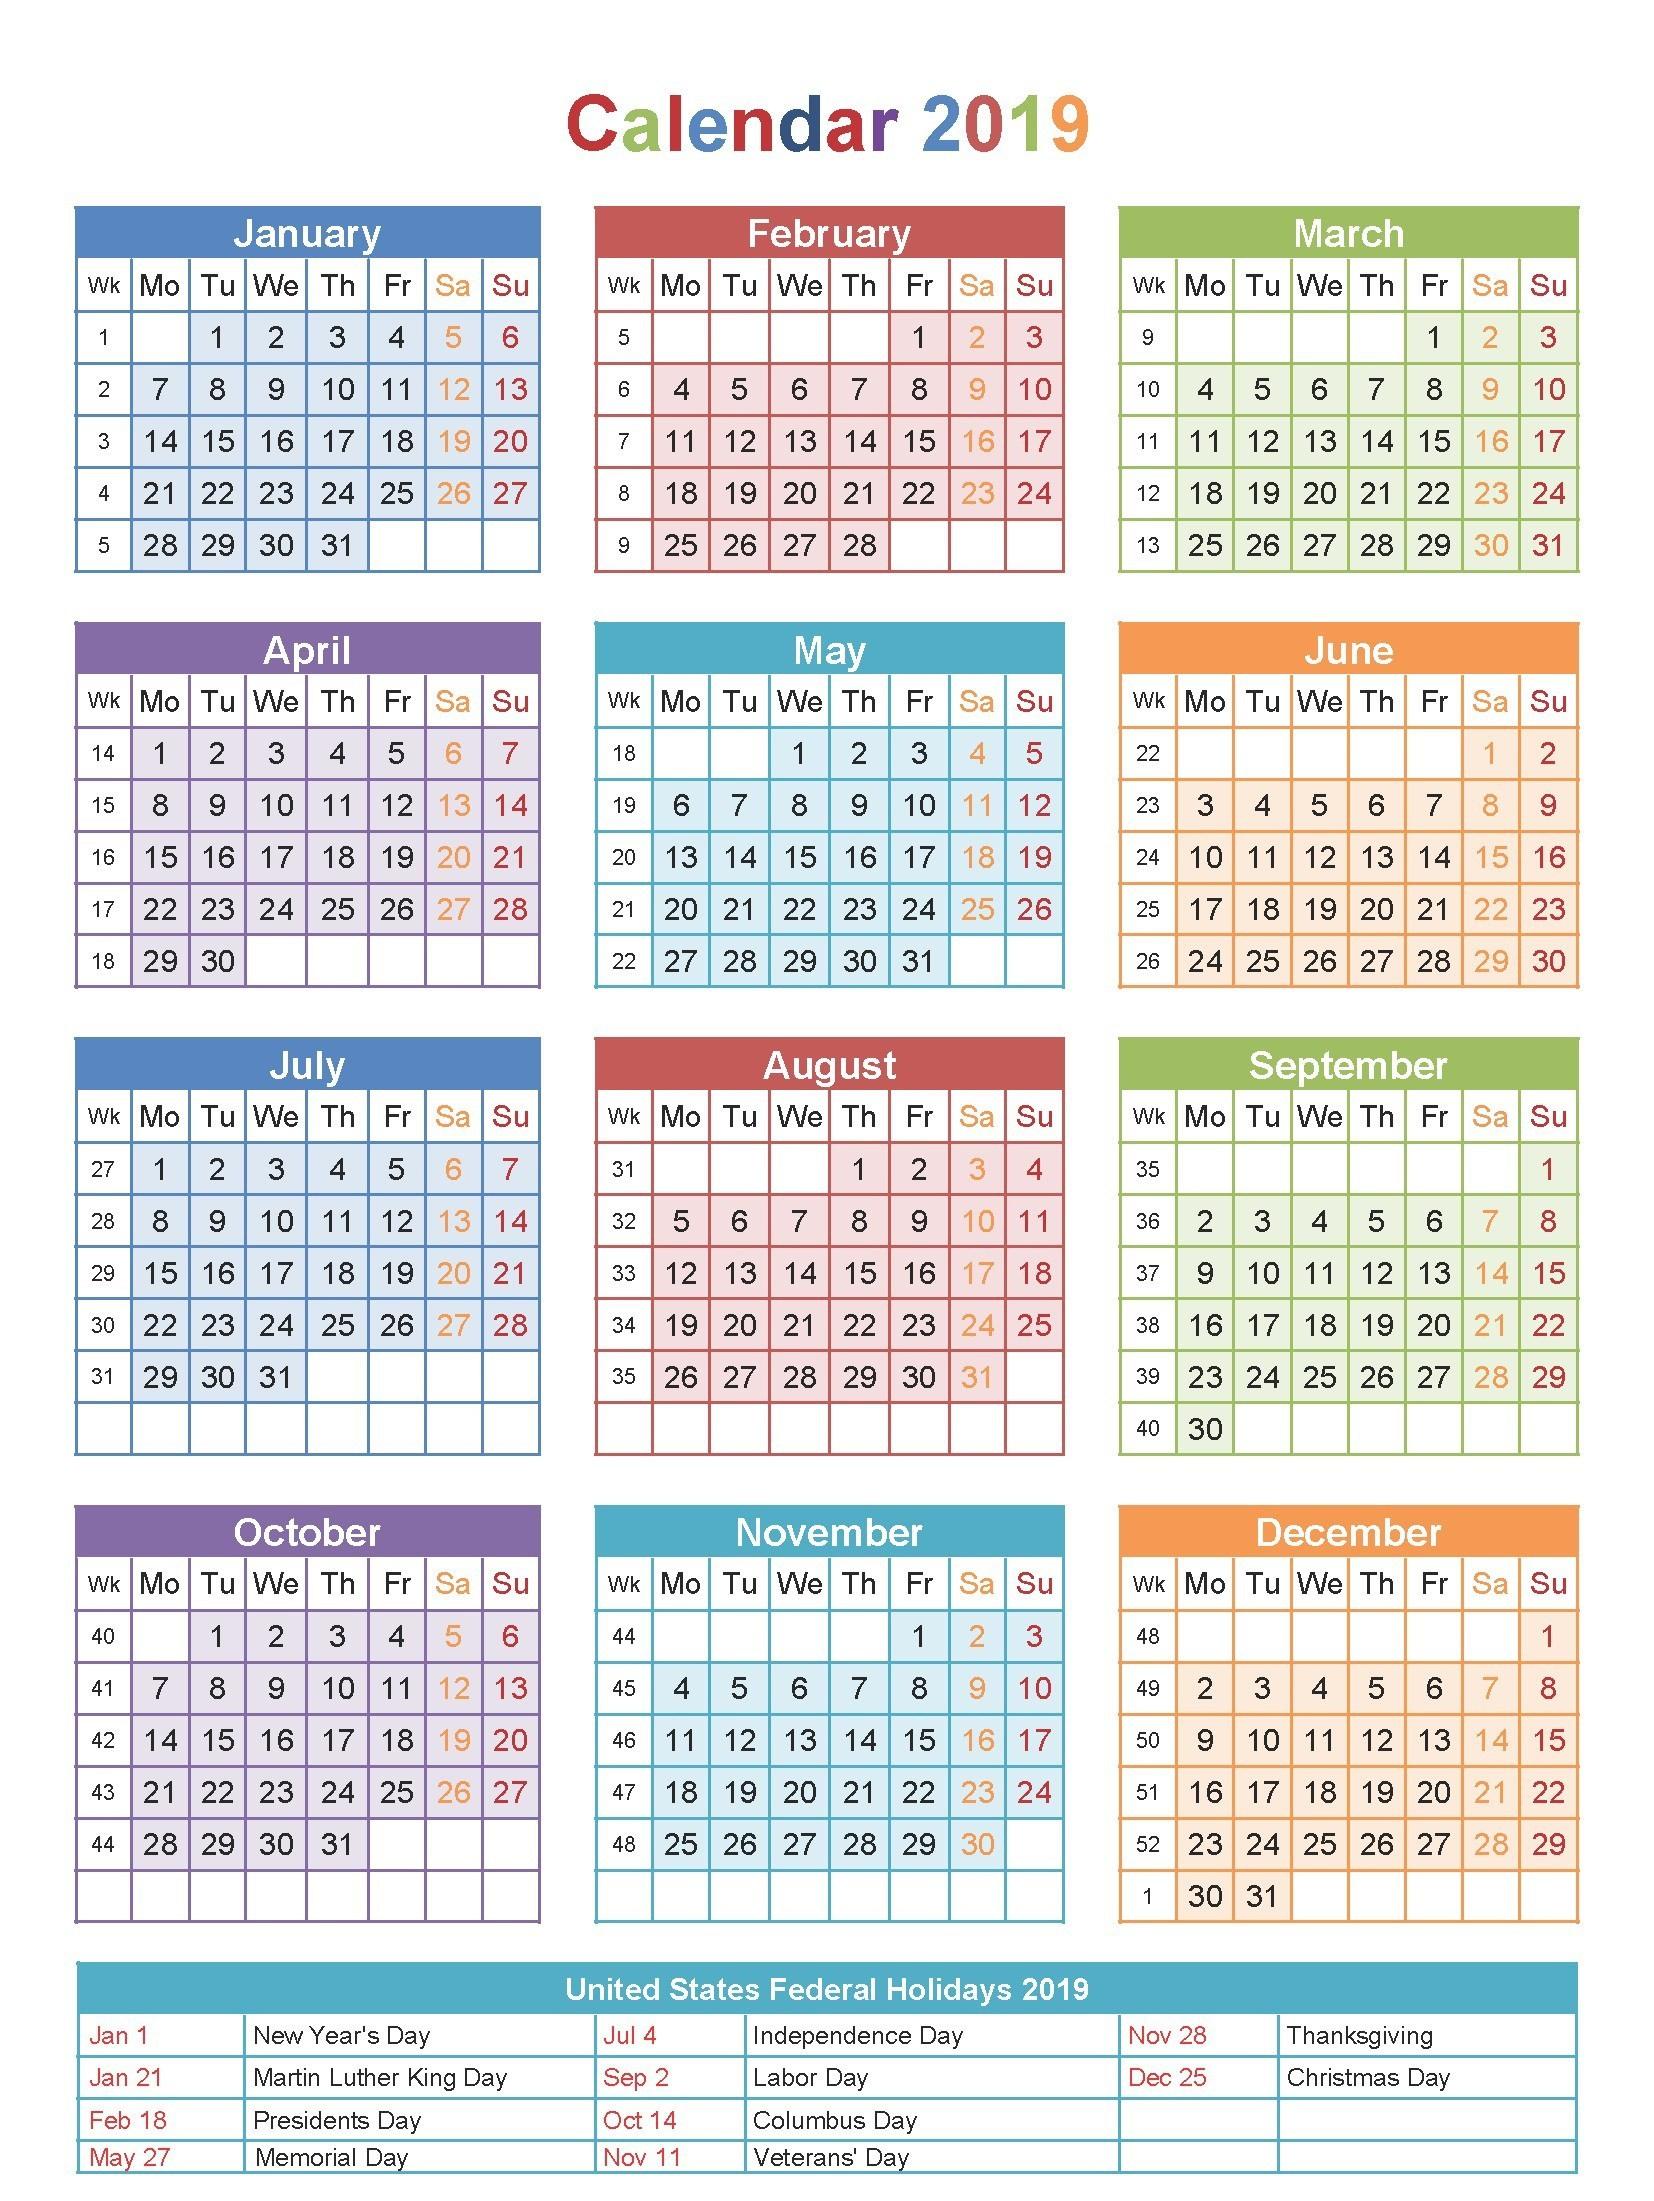 Blank Calendar 2019 Excel Más Recientes Myanmar Calendar 2019 Printable Image Of Calendar Academic Of Blank Calendar 2019 Excel Más Recientes Collecting 2019 Calendar Excel Hk Calendar Free Printable